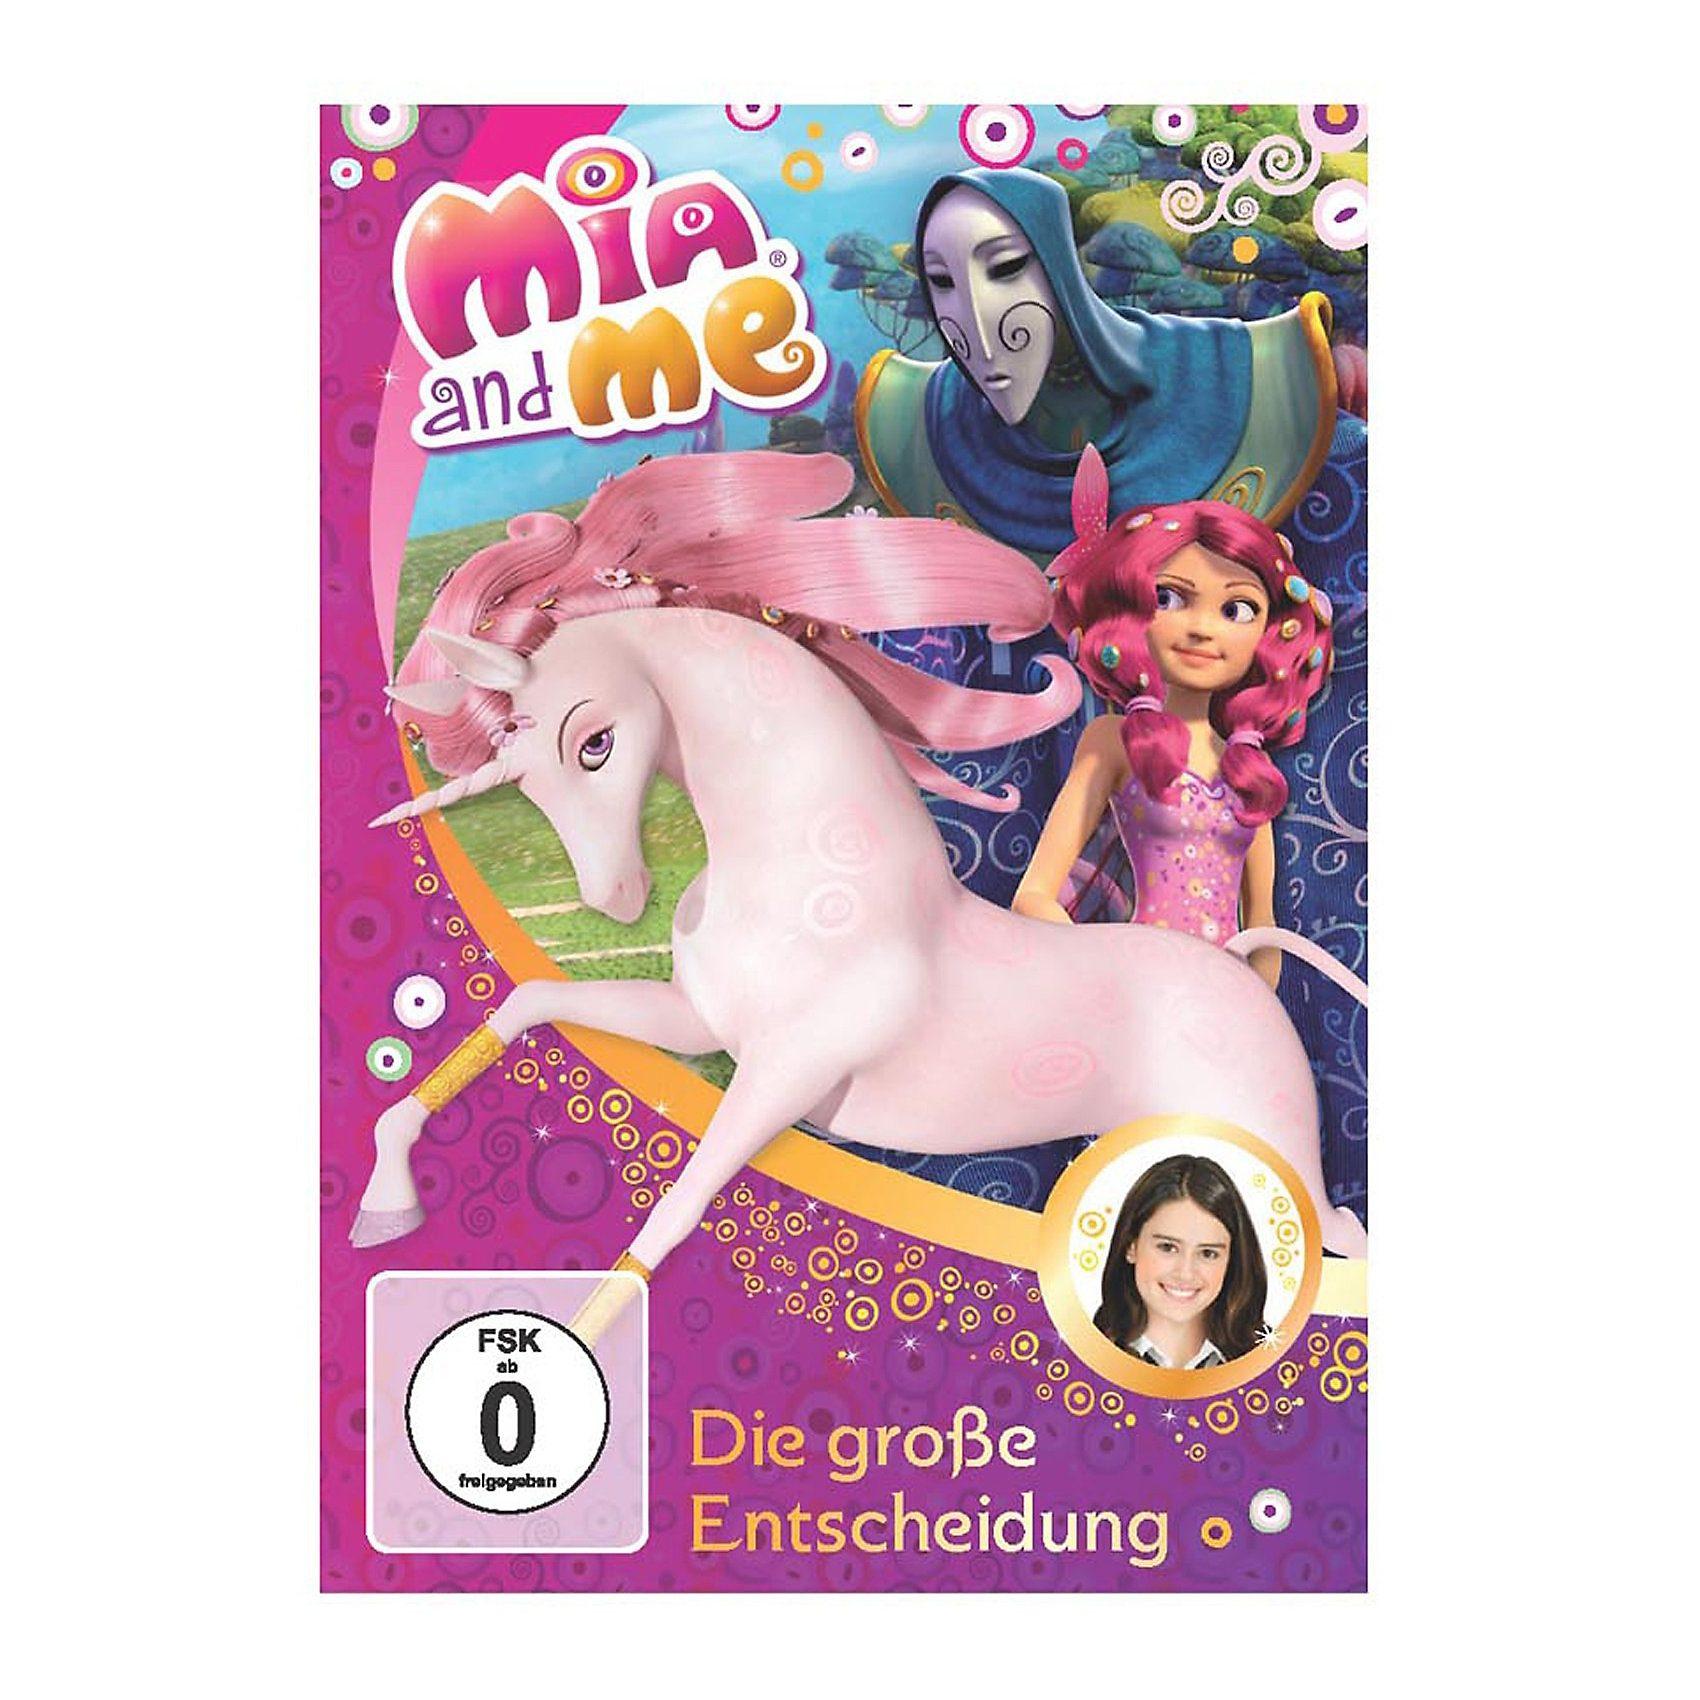 Edel DVD Mia and me 13 - Die große Entscheidung